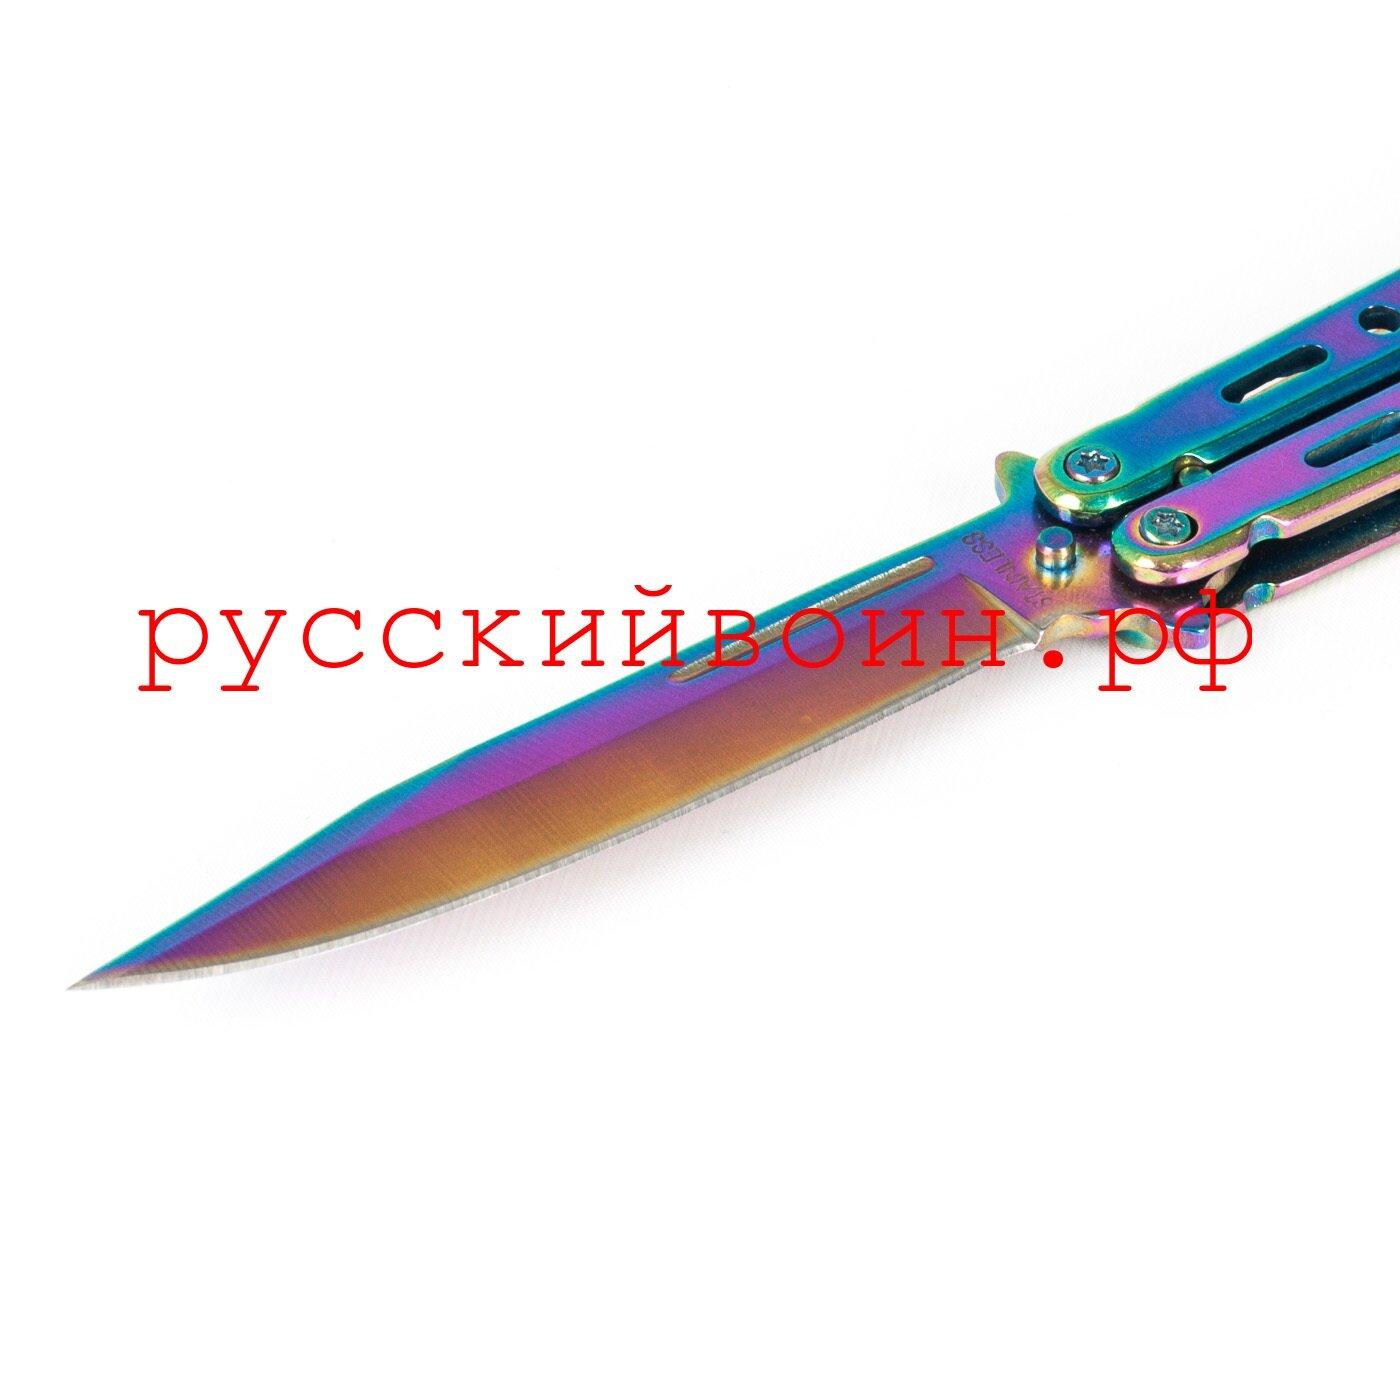 Нож-бабочка Explorer Градиент